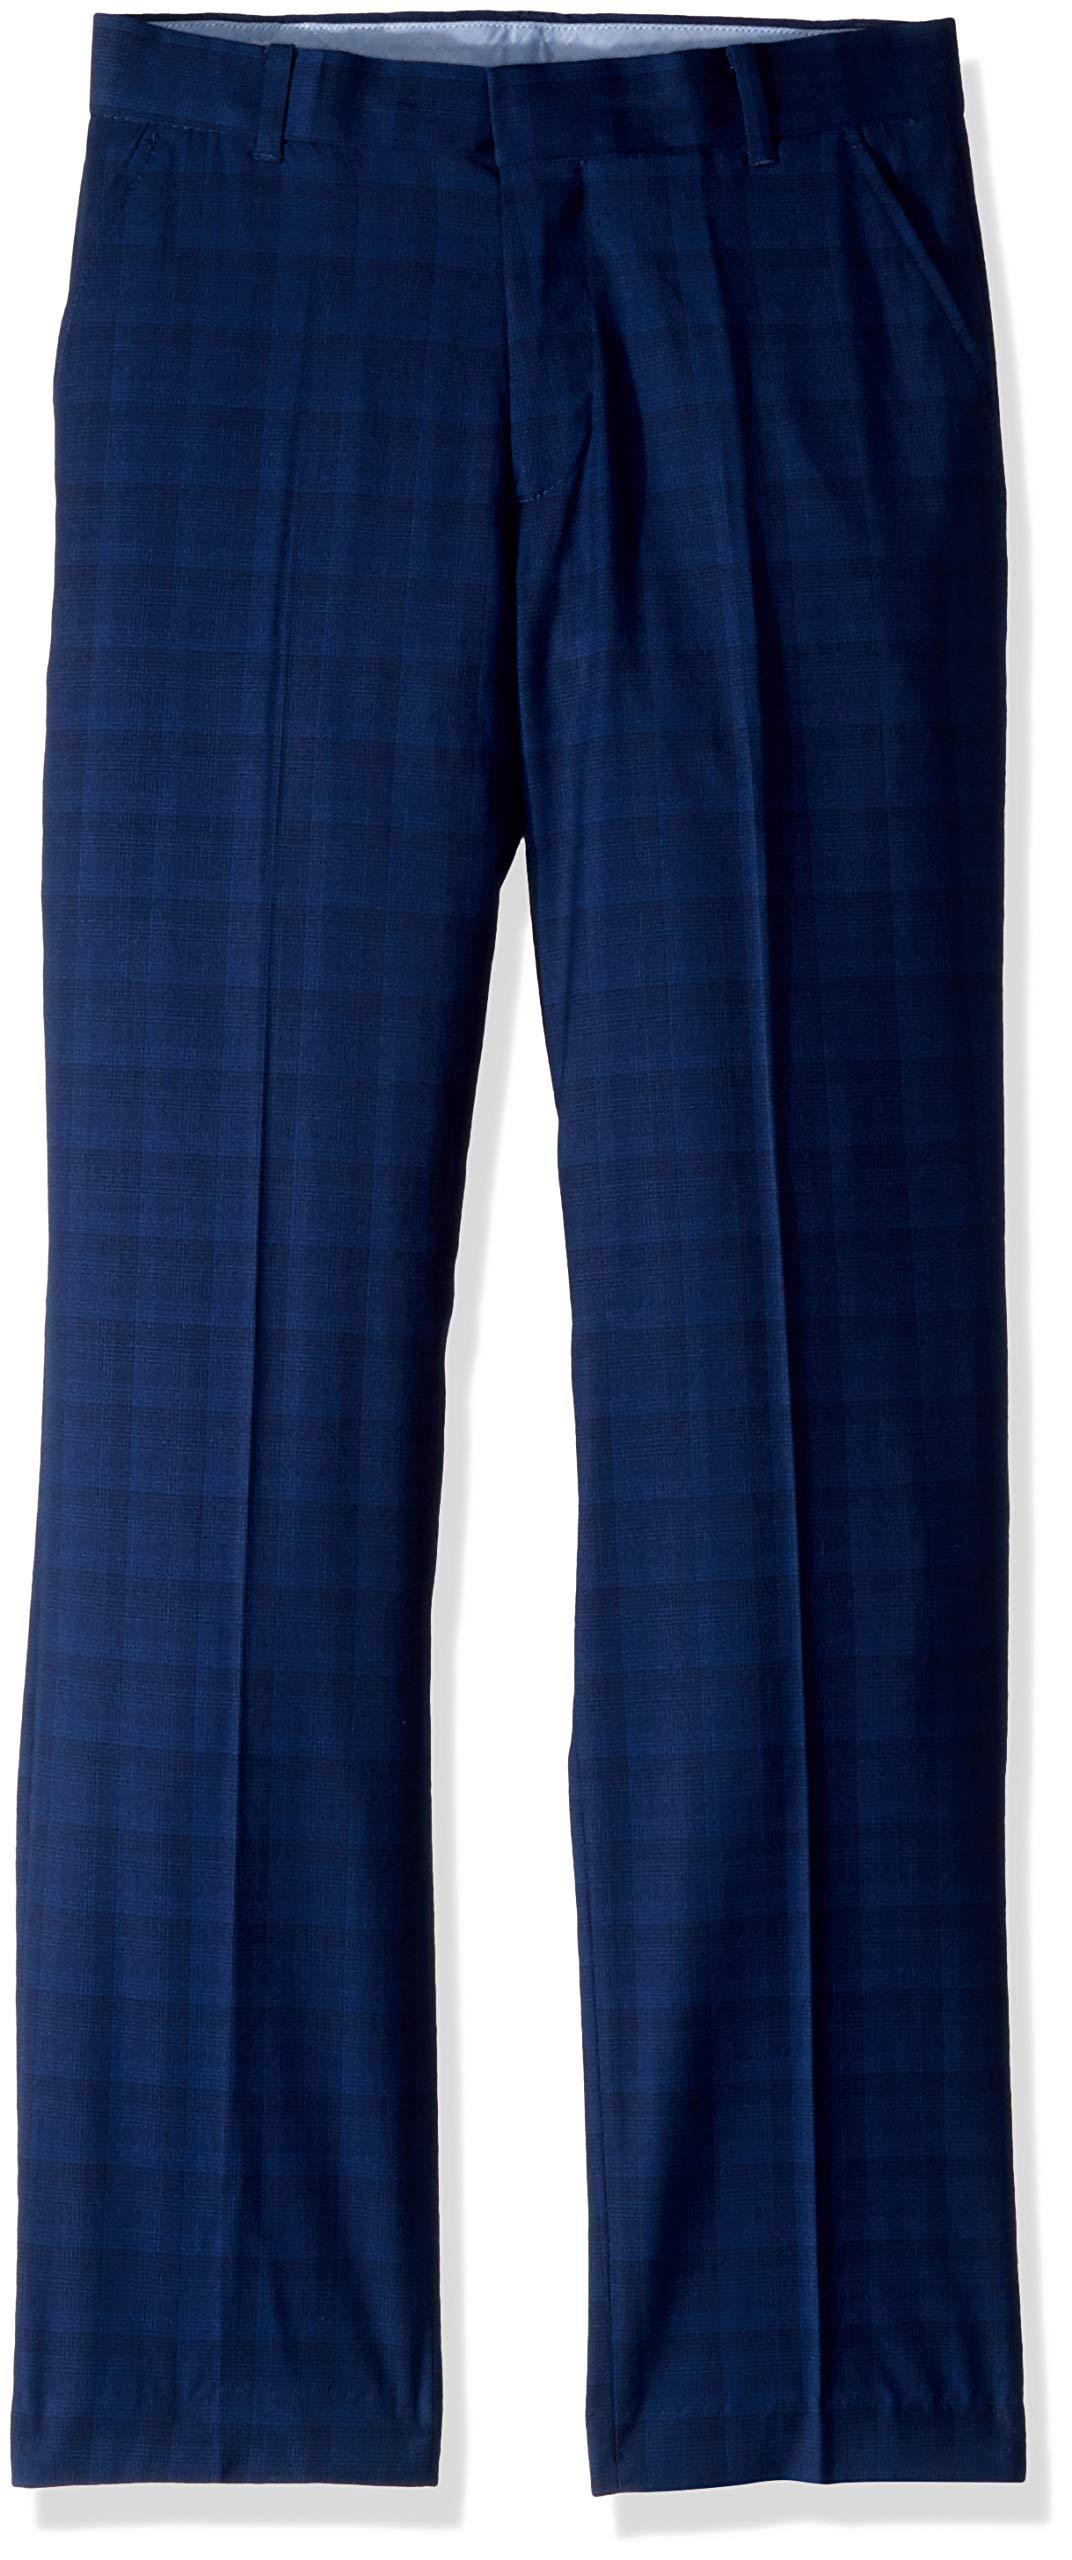 Tommy Hilfiger Boys' Big Flat Front Patterned Dress Pant, Midnight, 8